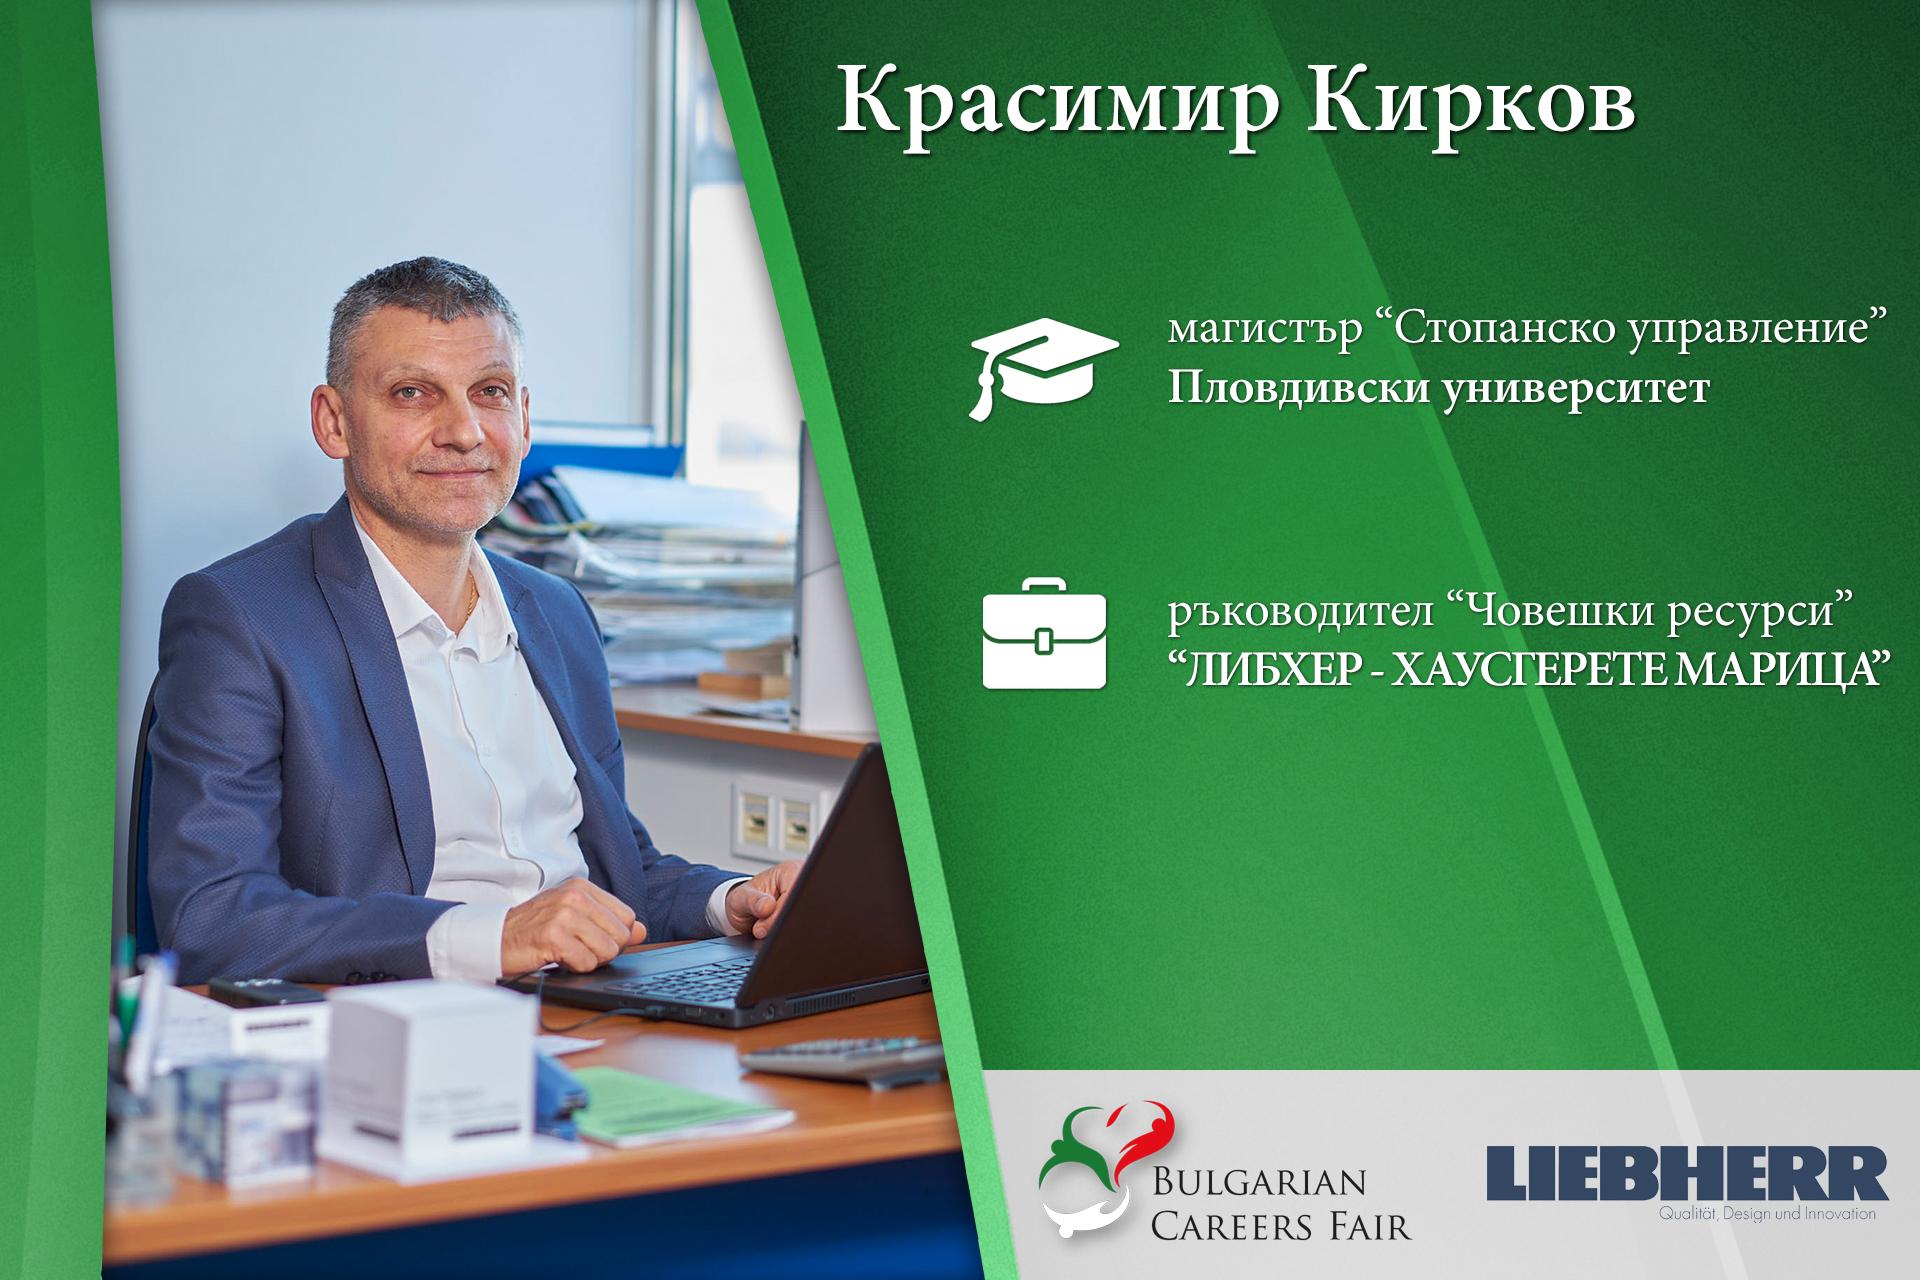 Krasimir-Kirkov_profile